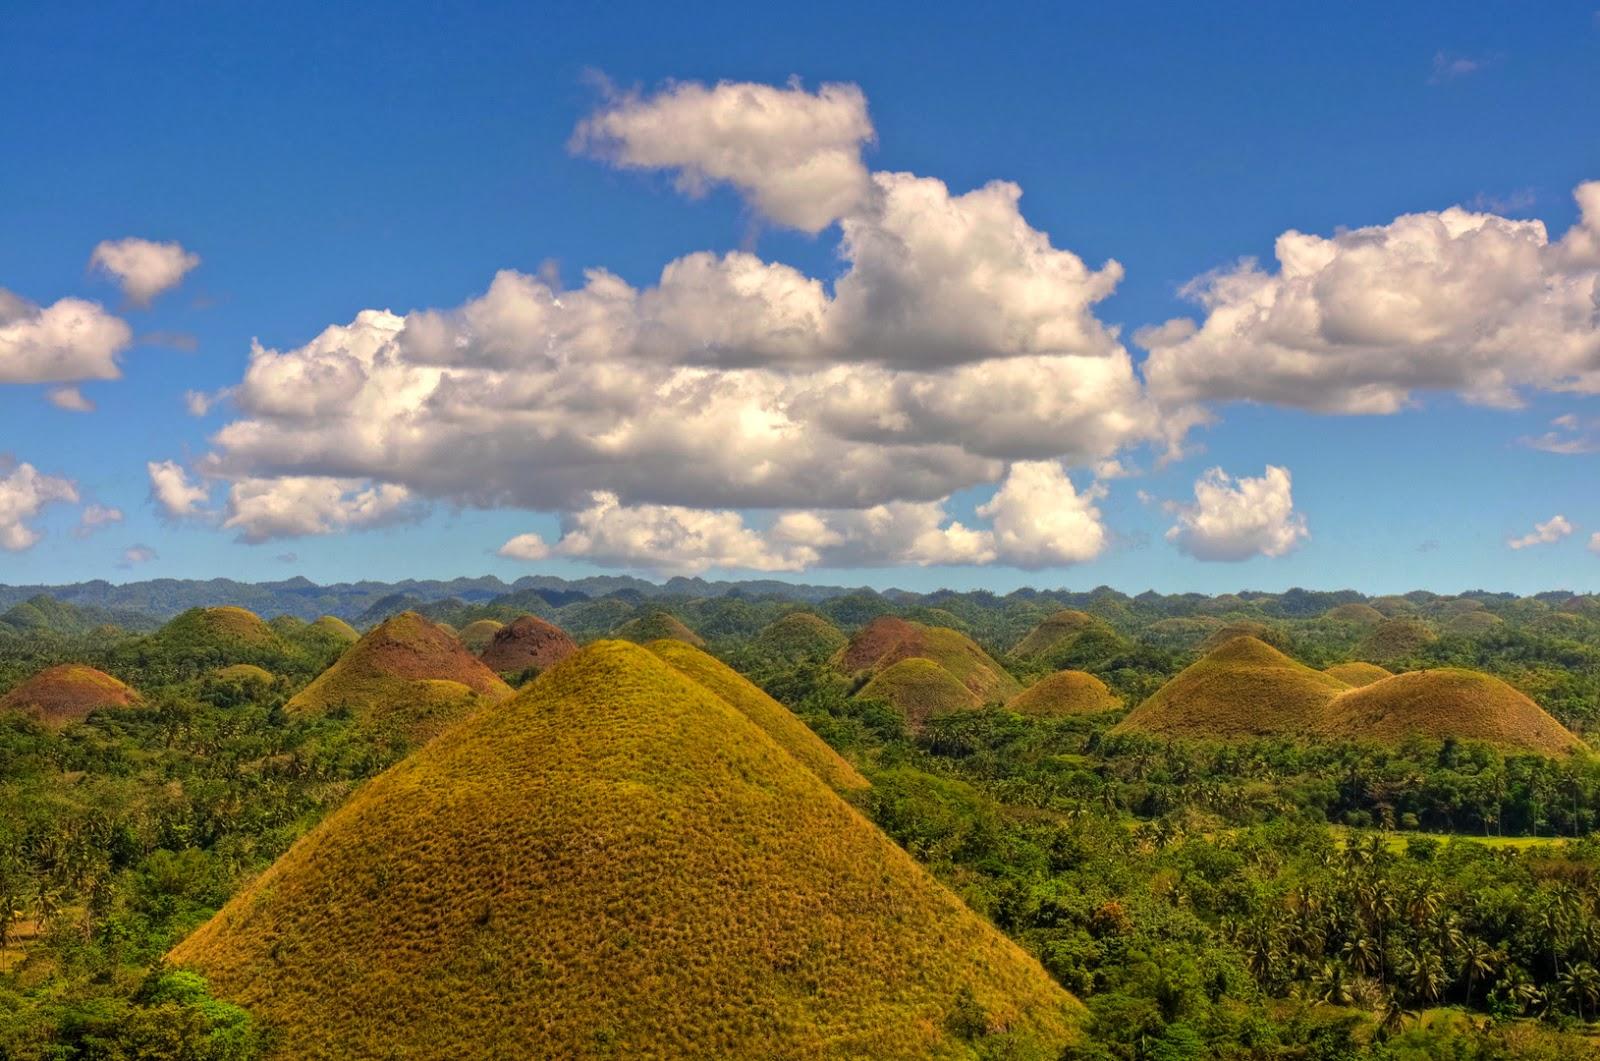 Le Chocolate Hills nelle Filippine